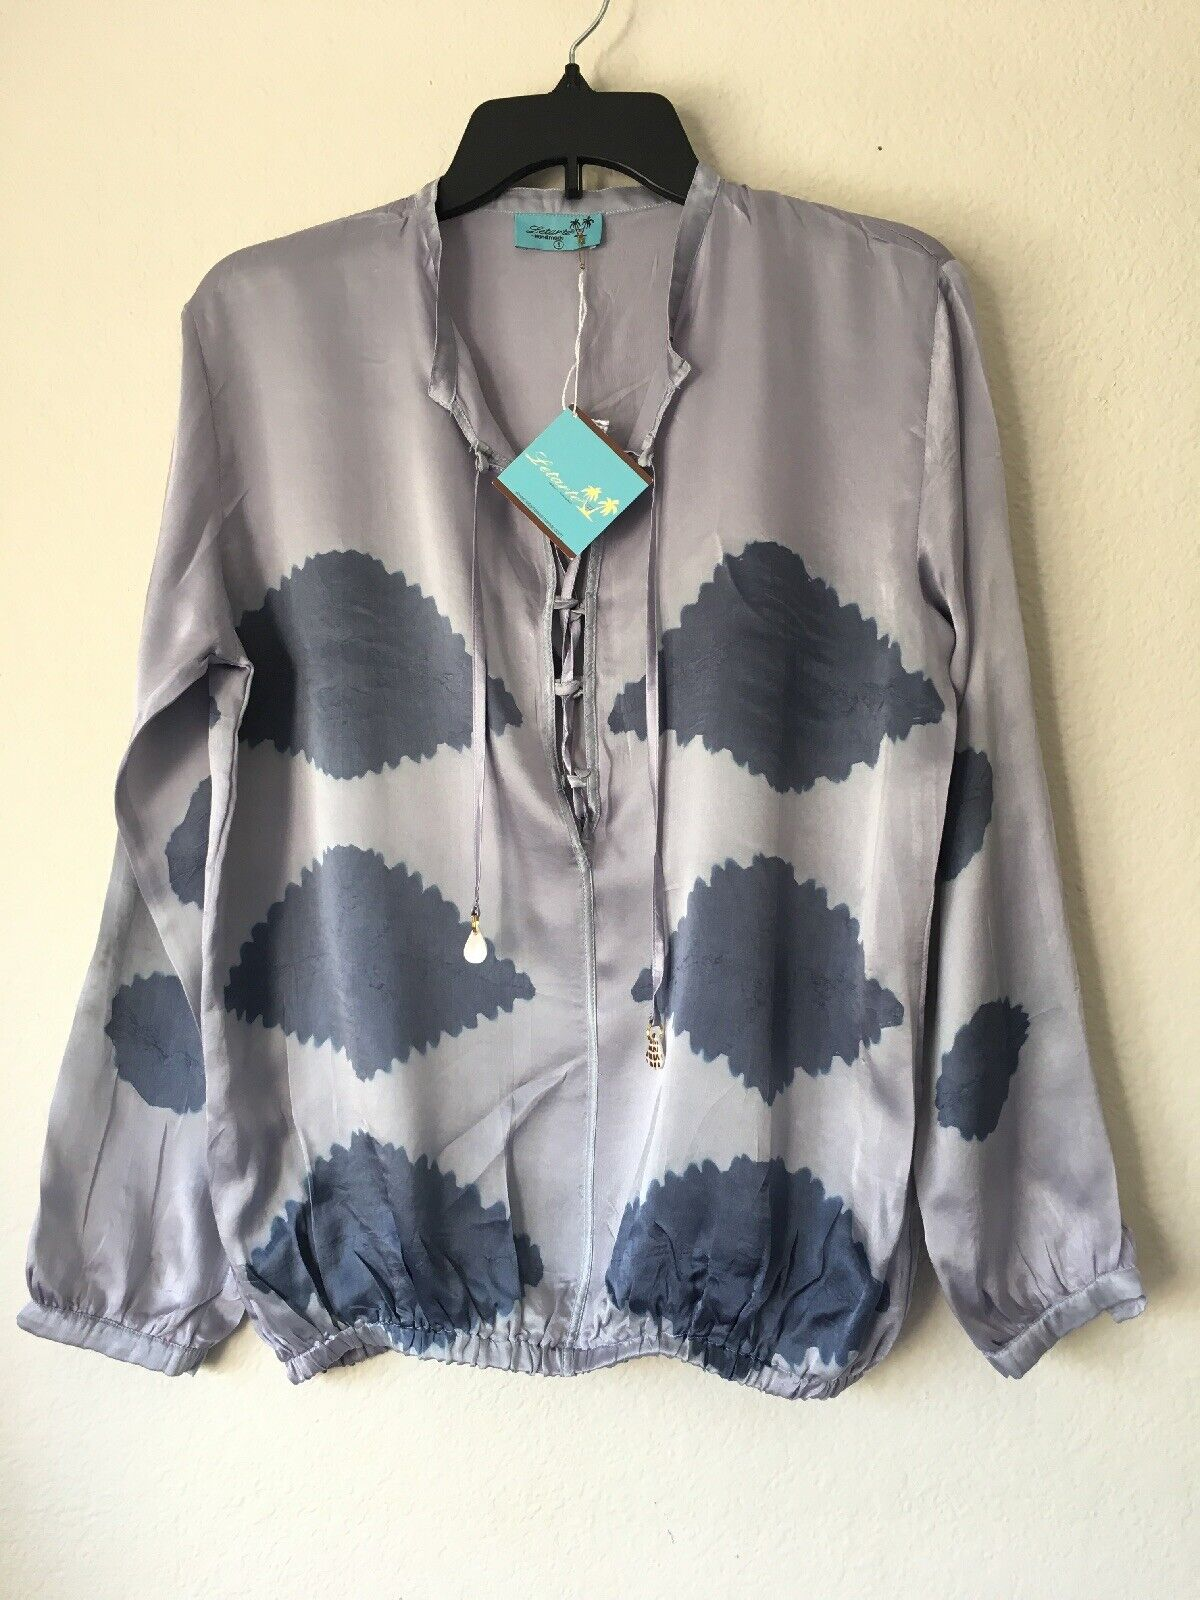 Letarte Handmade damen Long Sleeve Blouse Top Blau Abstract Silk Größe Small